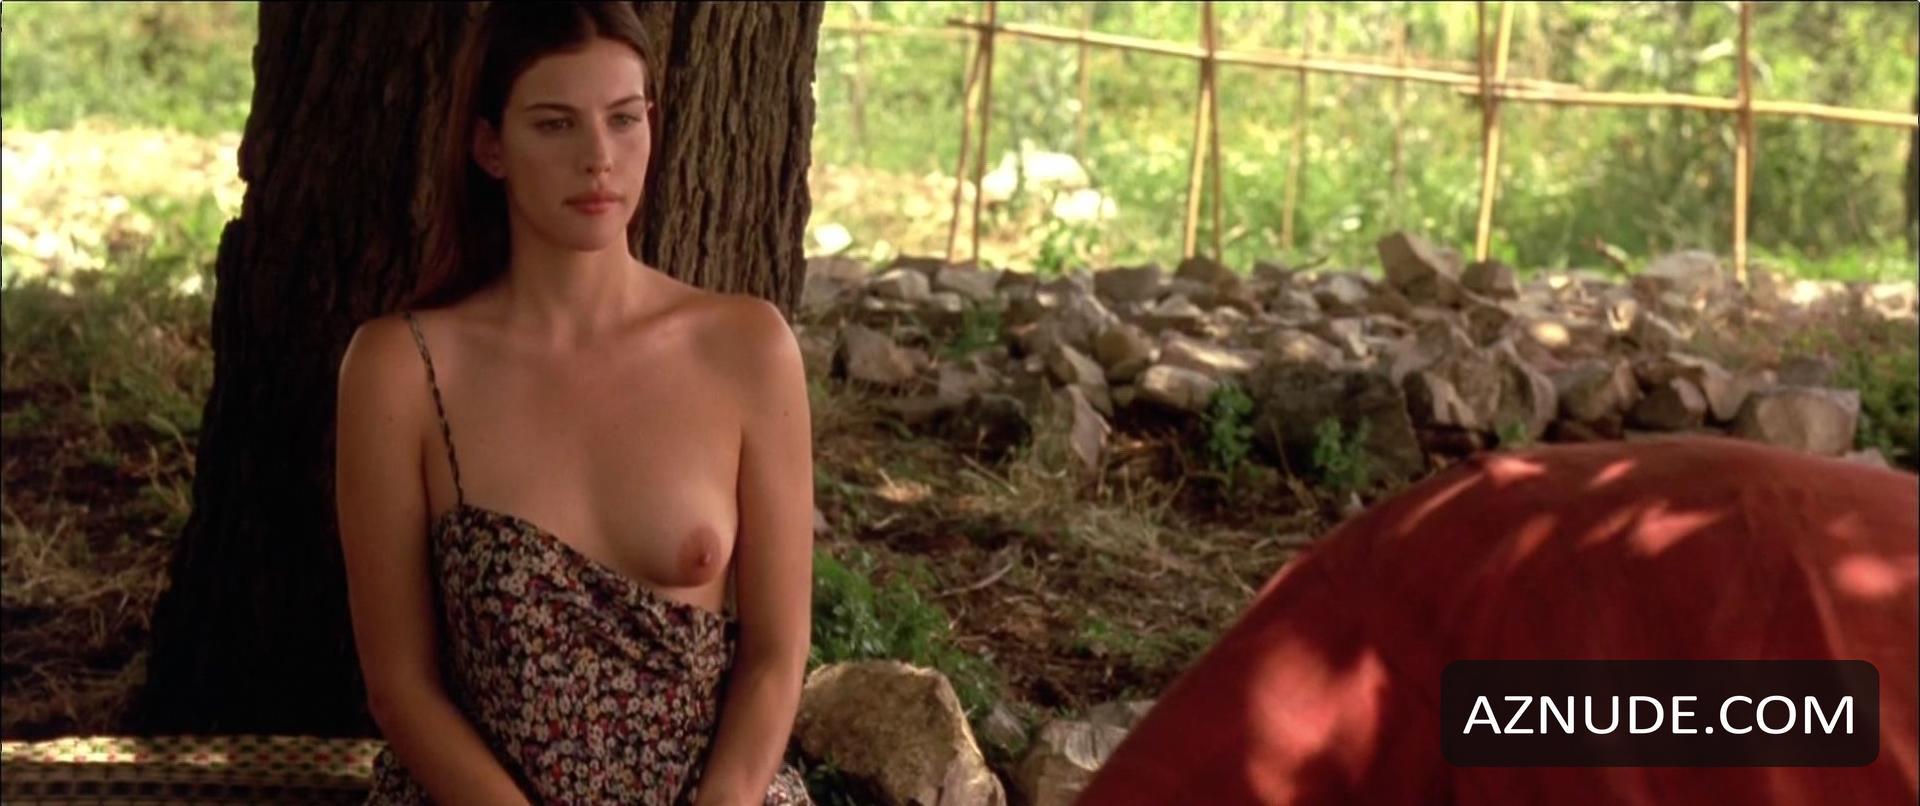 nude beauty tyler Liv stealing